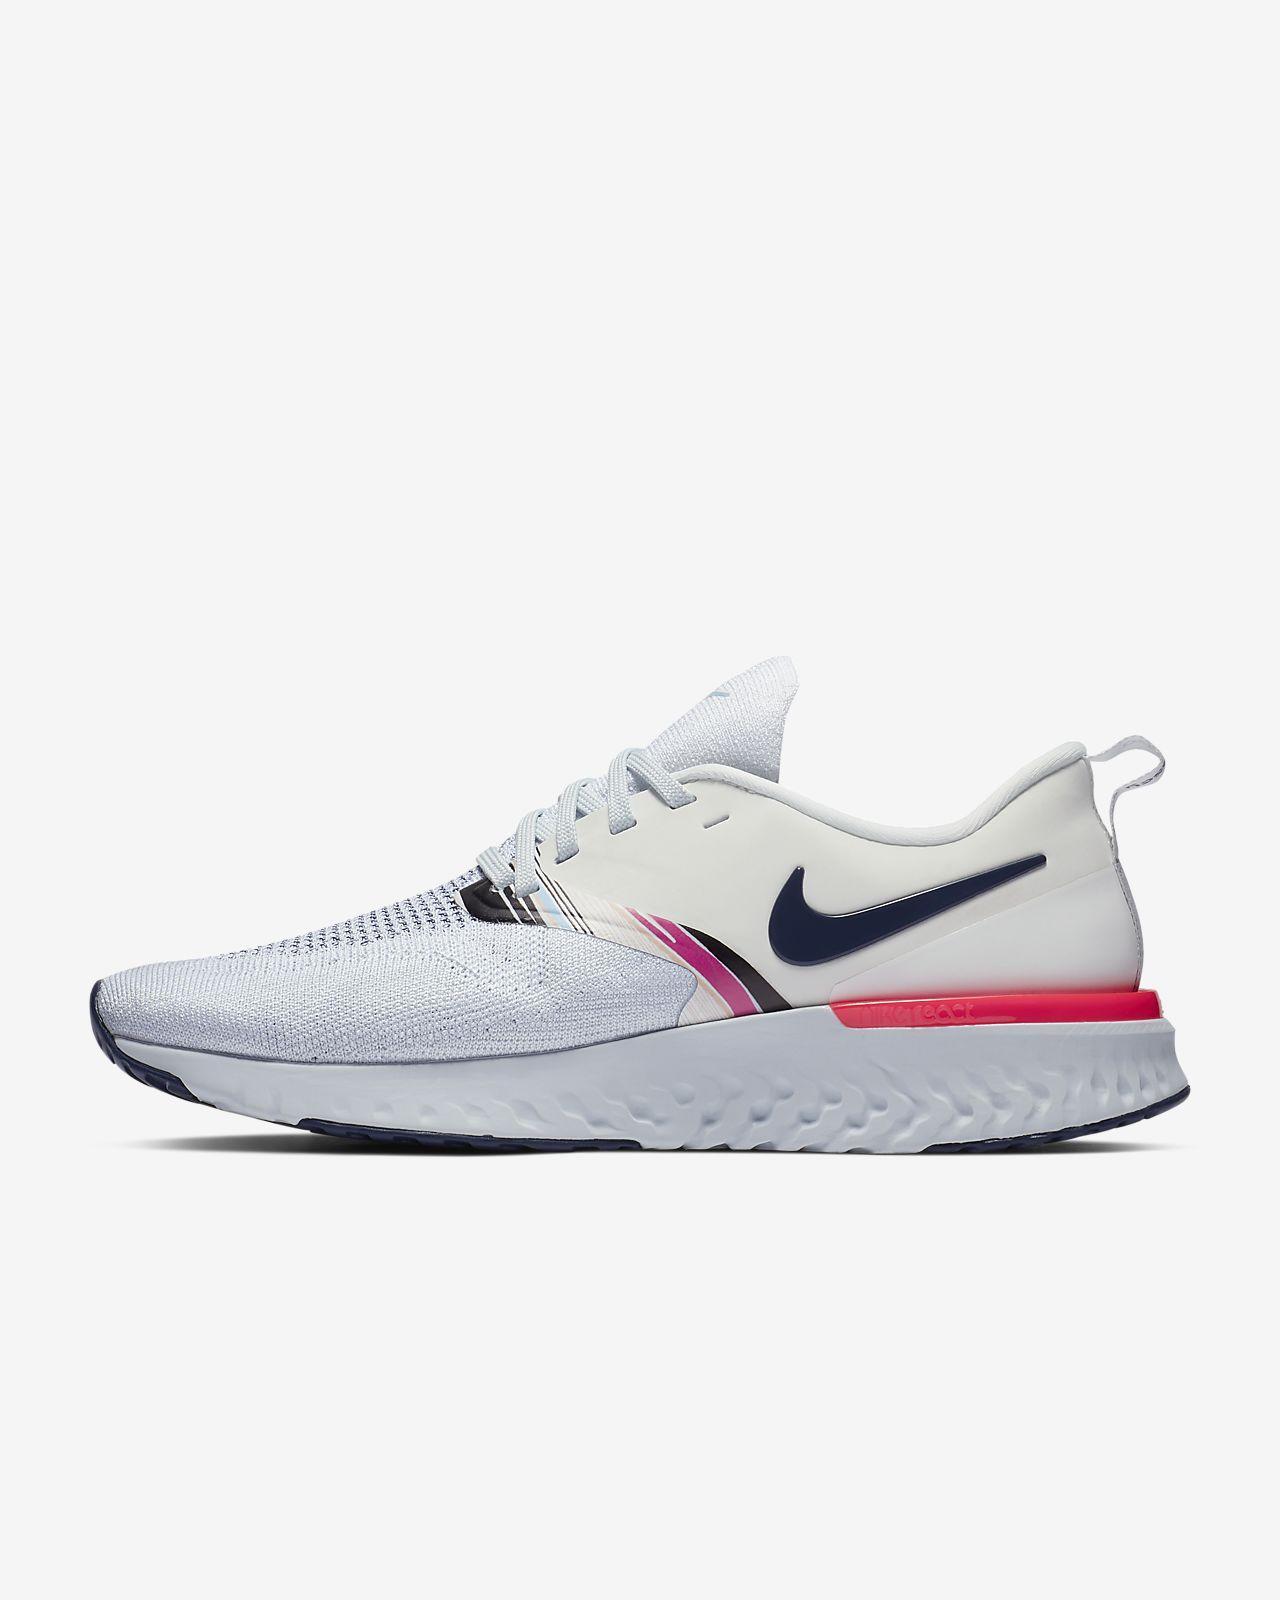 0e2ed755e5853 Calzado de running para mujer Nike Odyssey React Flyknit 2 Premium ...